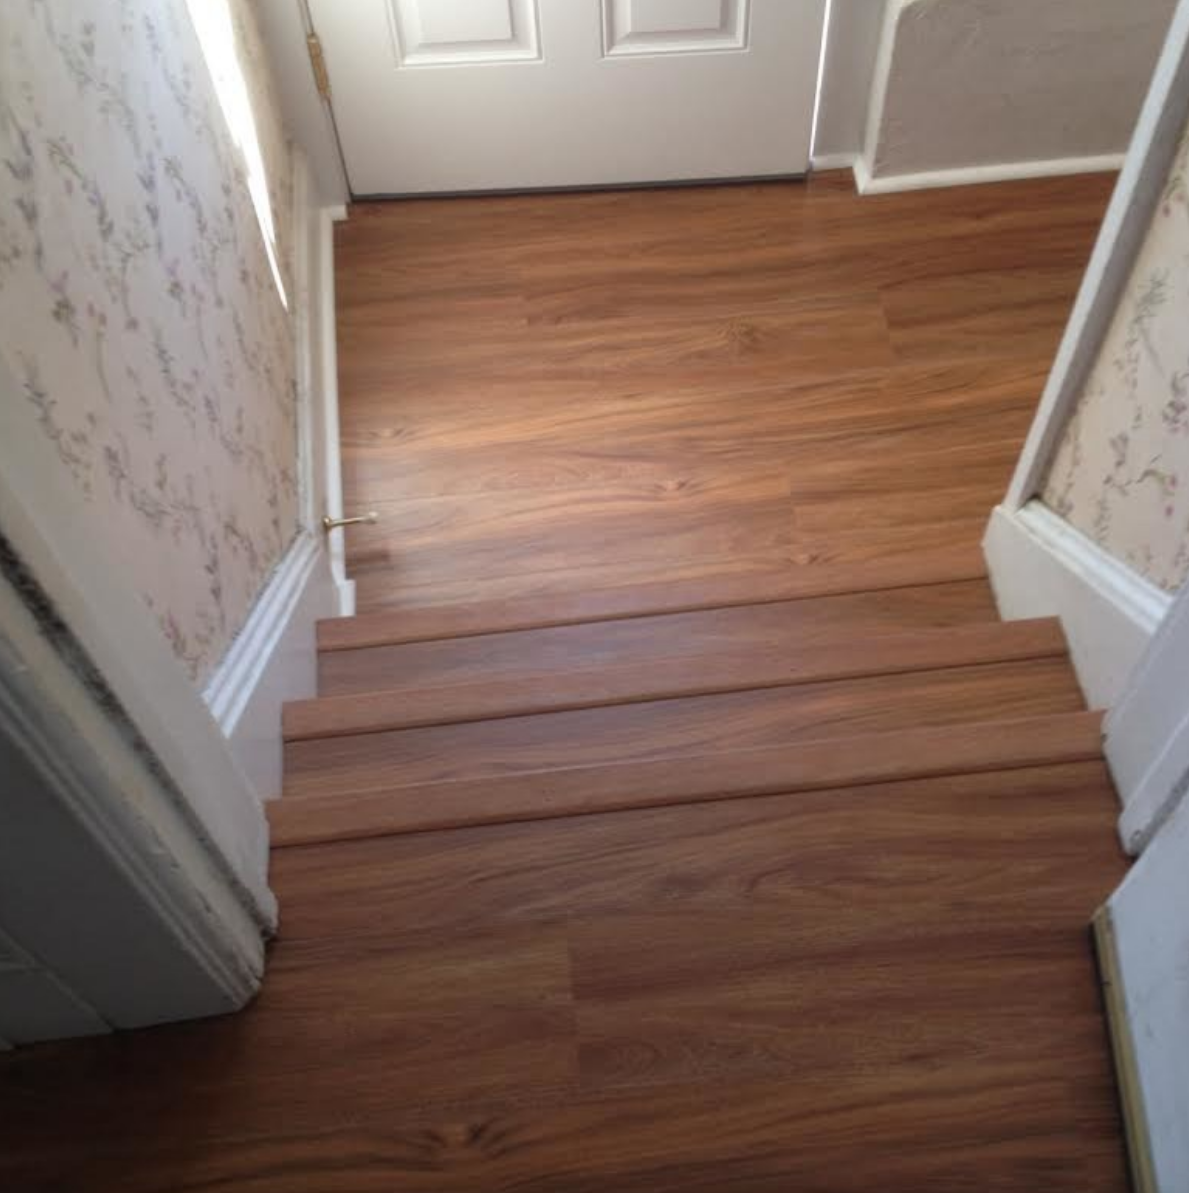 Coretec Lvt Unsure Which Color Possibly Dakota Walnut Flooring Remodel Hardwood Floors